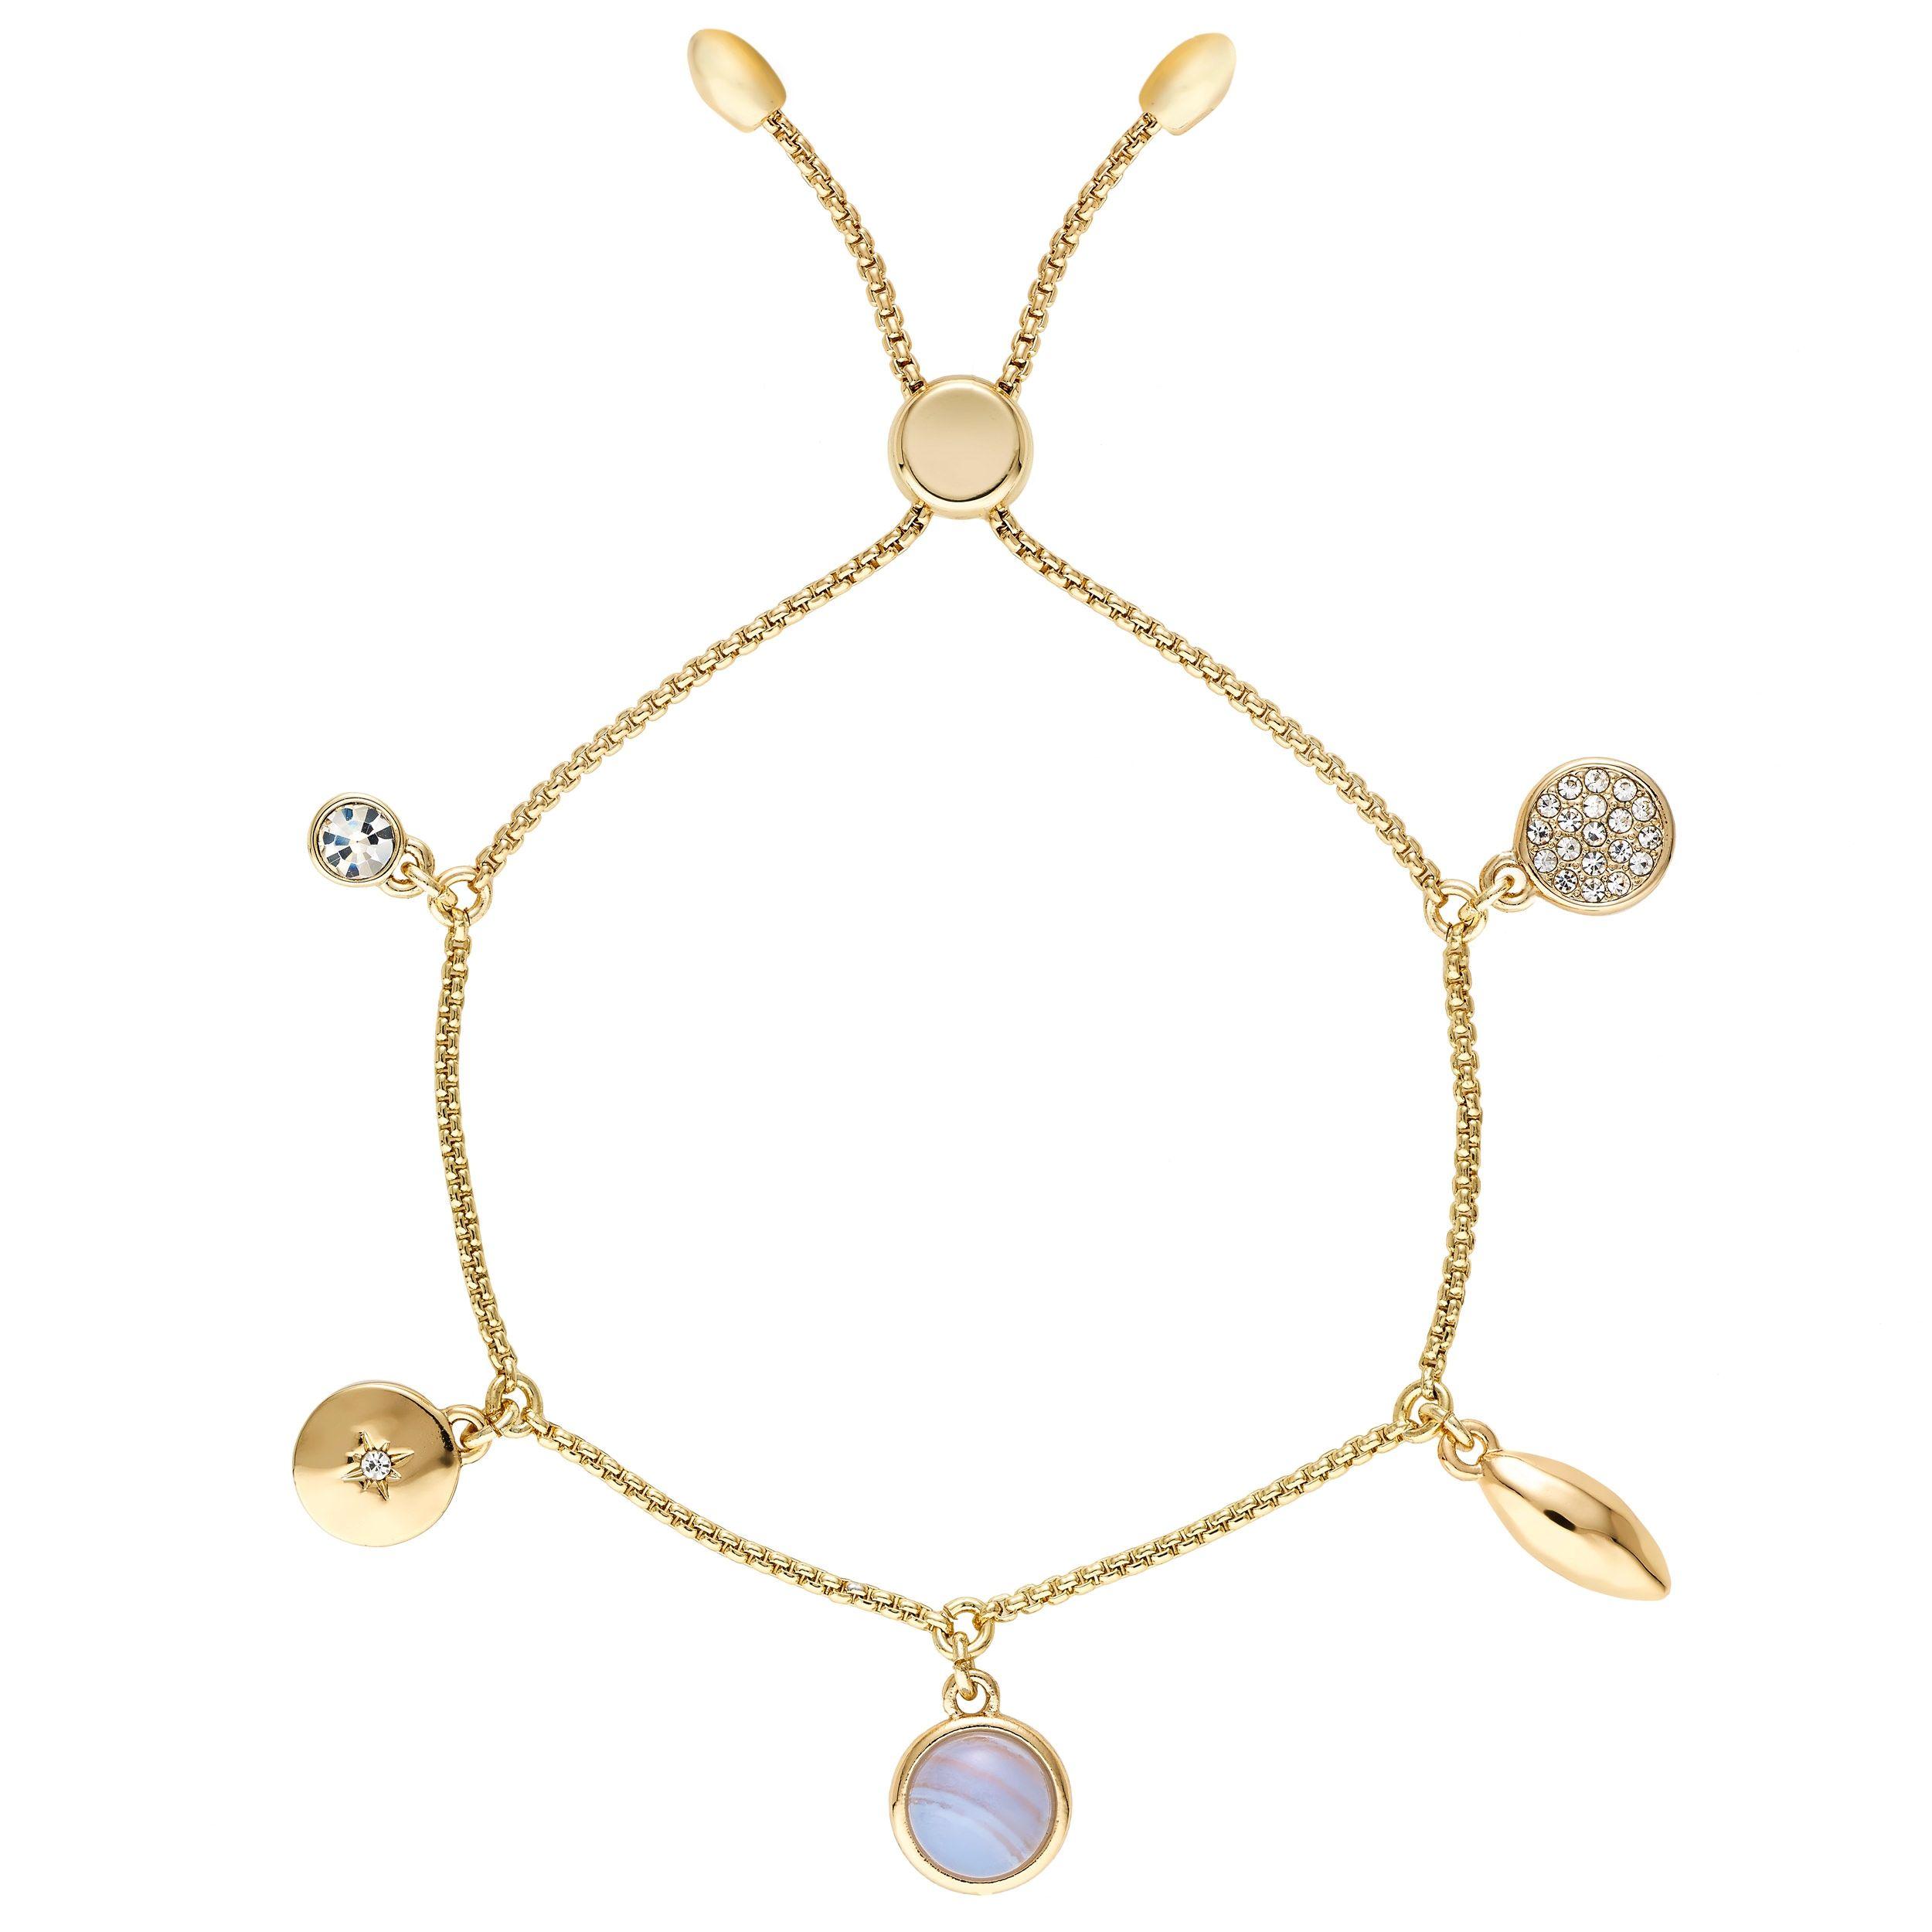 Buckley London Eyre Hammered Charm Bracelet